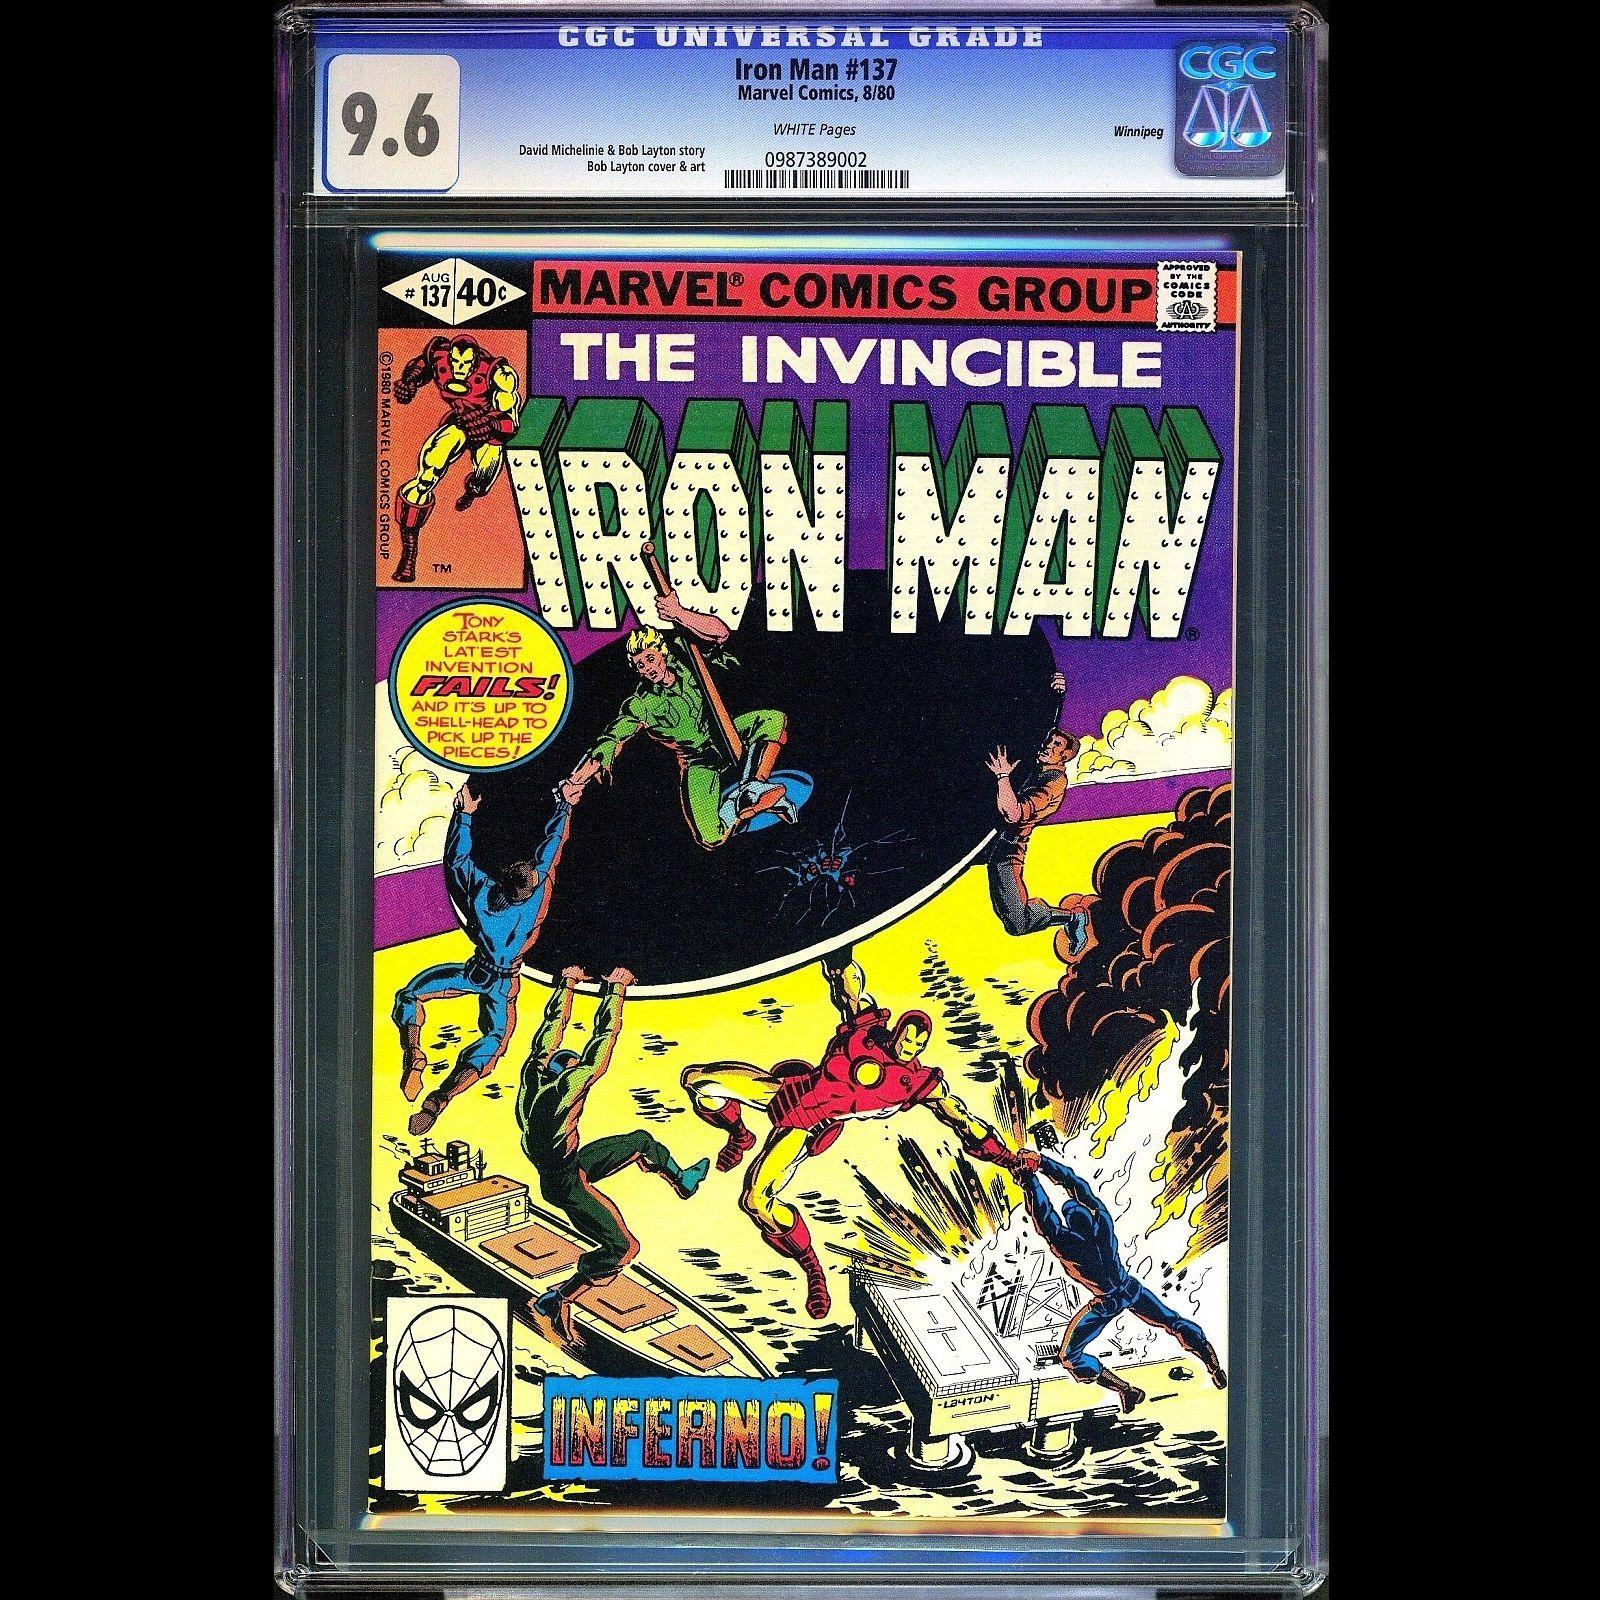 IRON MAN #137 CGC 9.6 WINNIPEG PEDIGREE SPIDER MAN DEADPOOL WOLVERINE AVENGERS